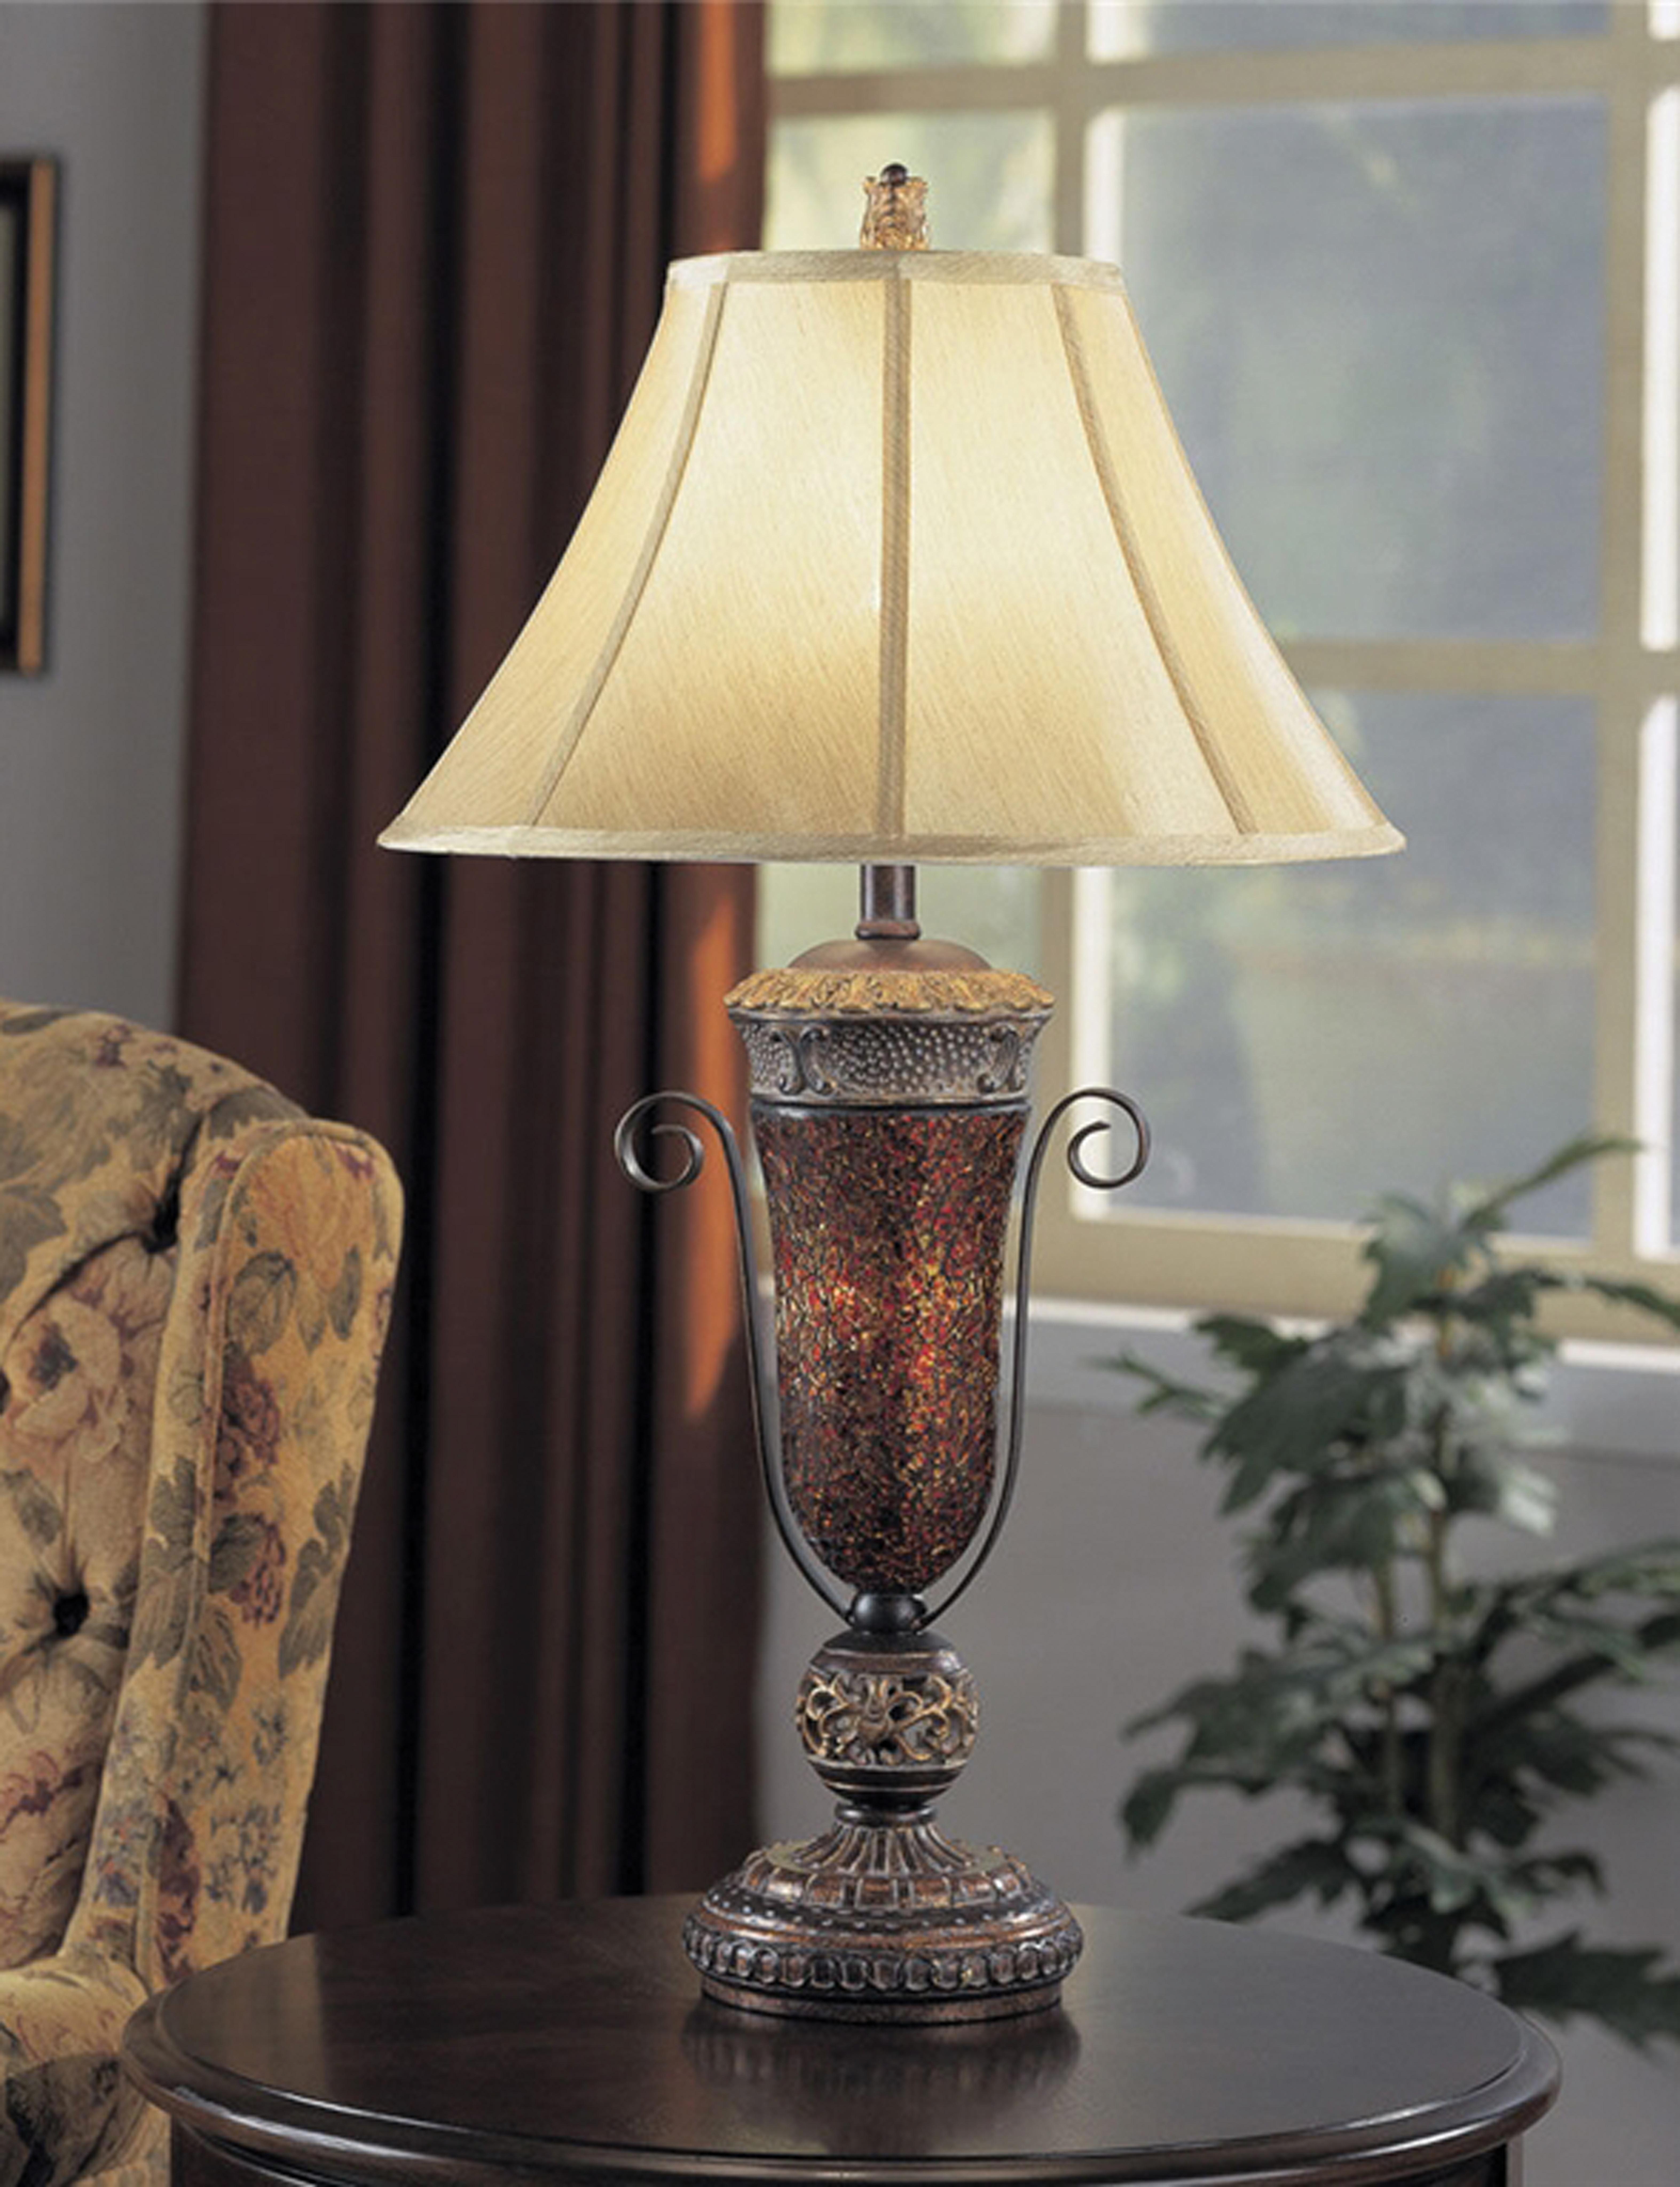 Mosaic Table Lamp Anthony California, Inc.   653385